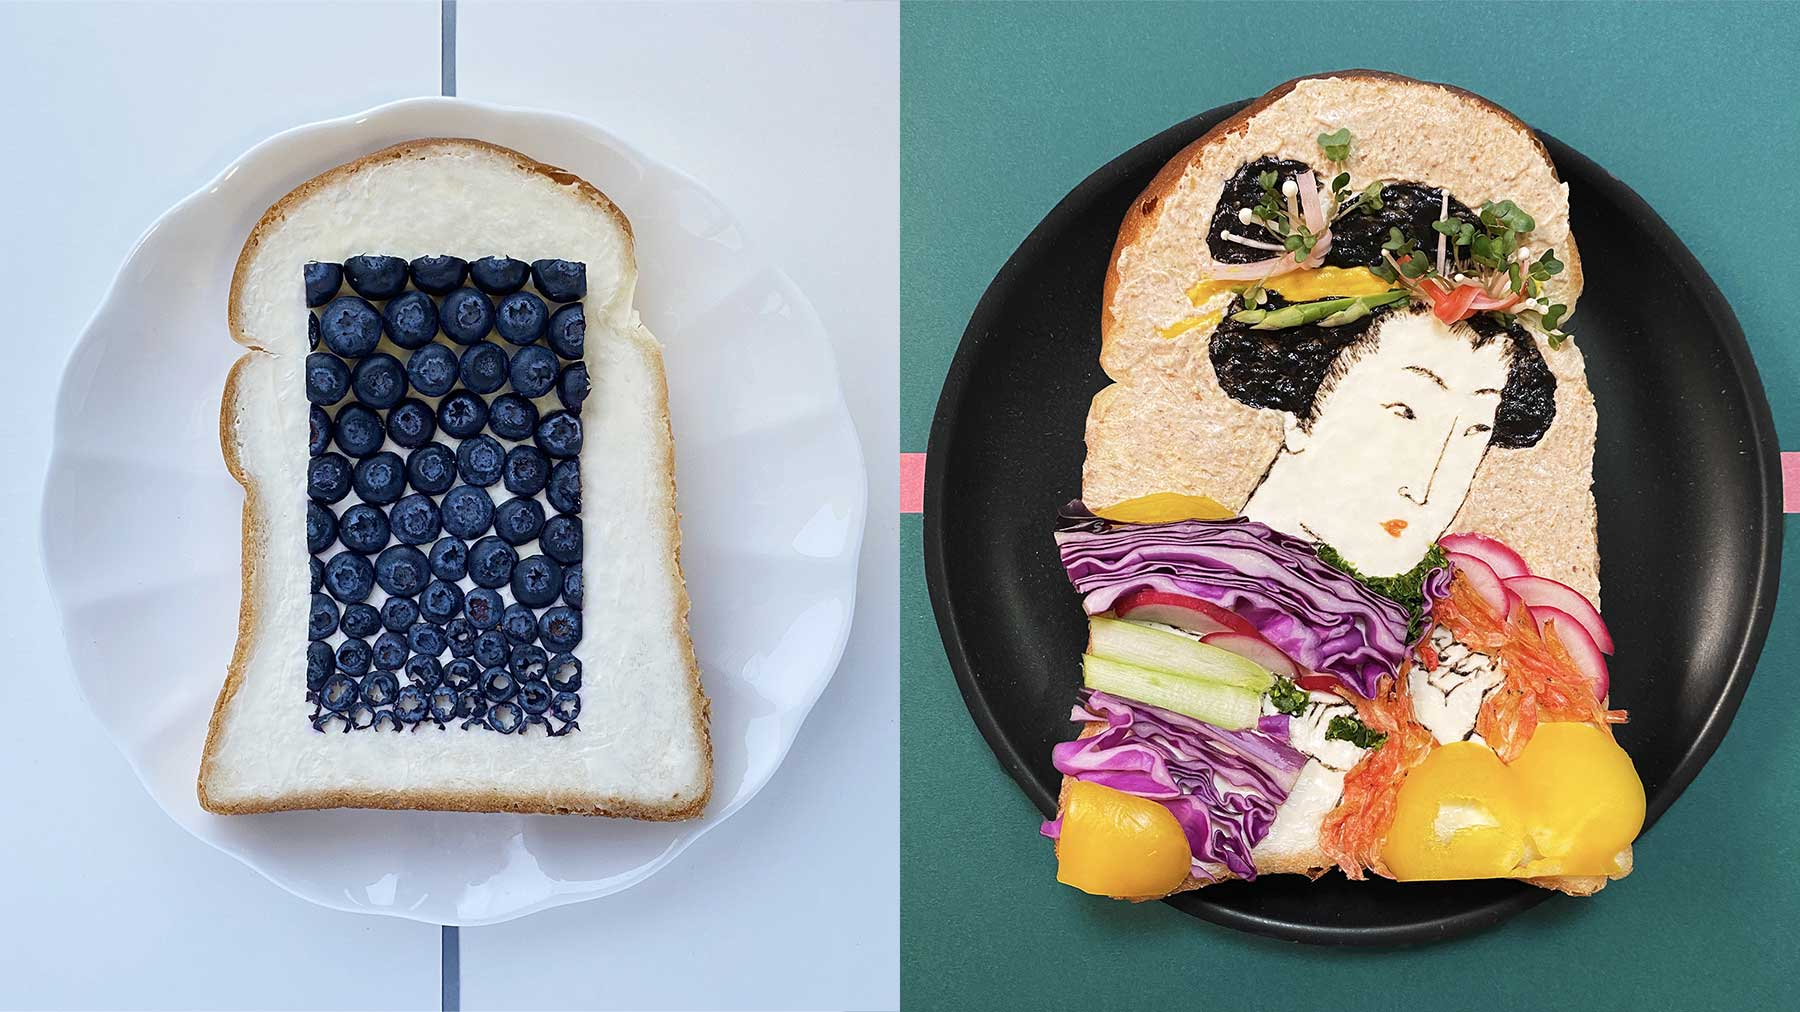 Brotscheiben-Kunstwerke von Manami Sasaki Manami-Sasaki_00